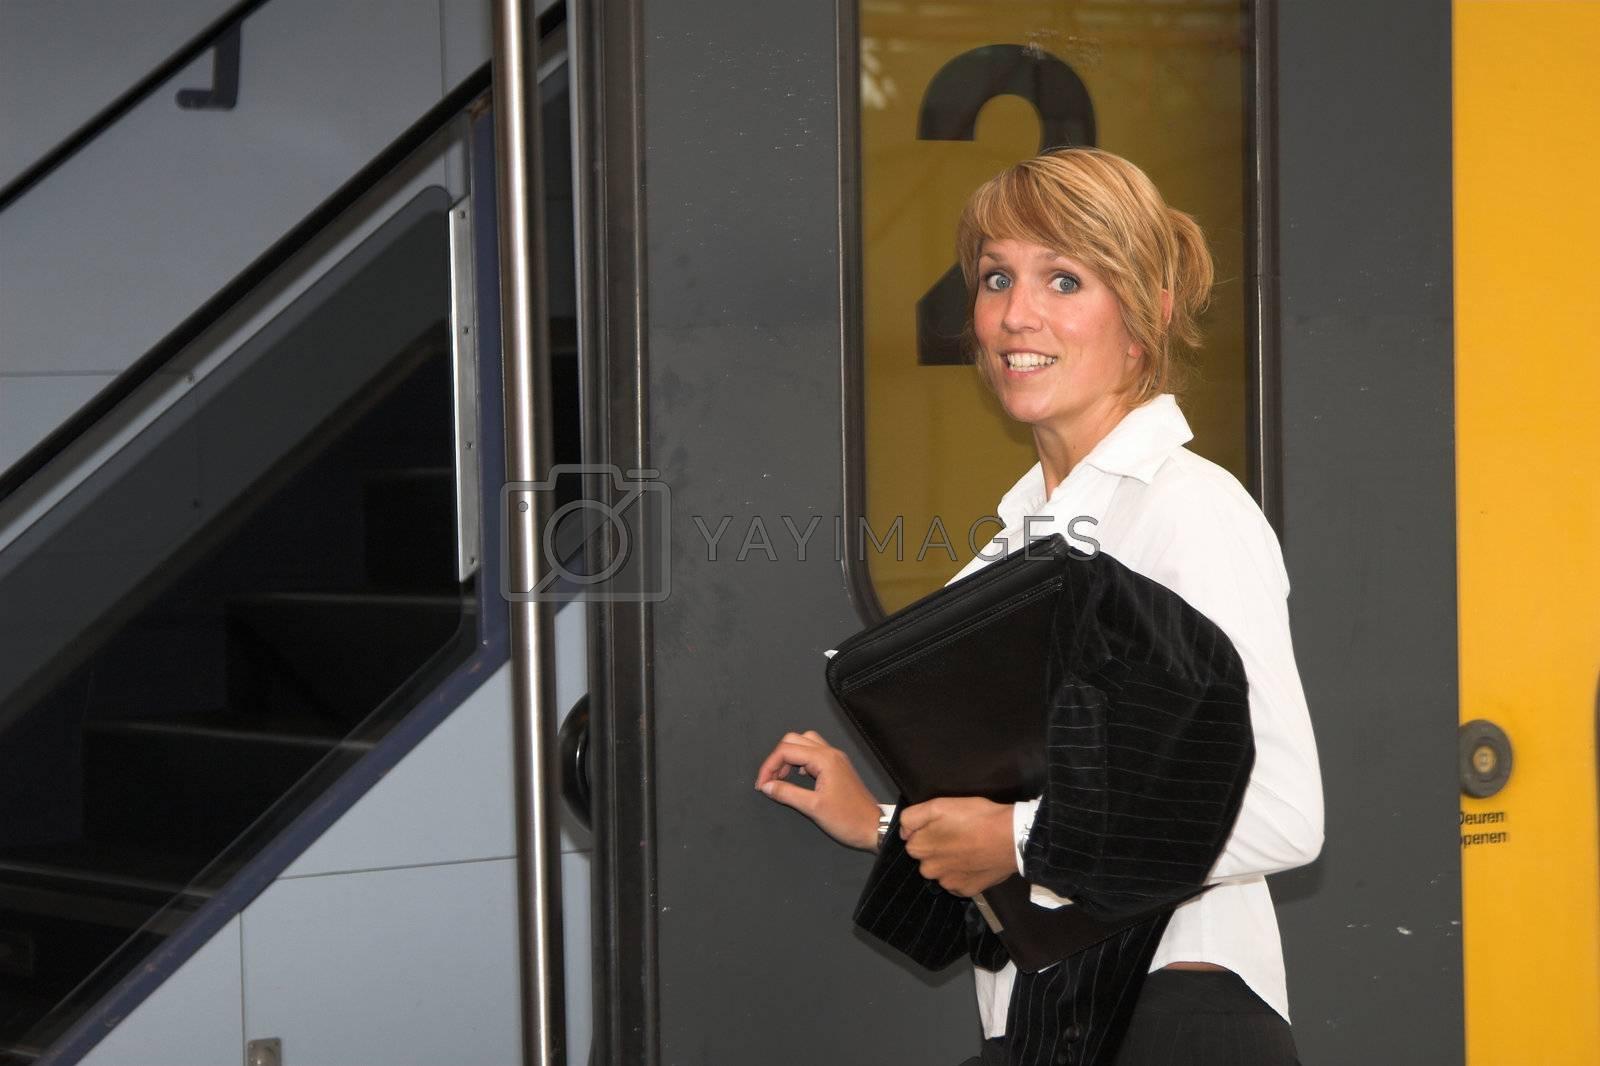 Pretty businesswoman getting on the train